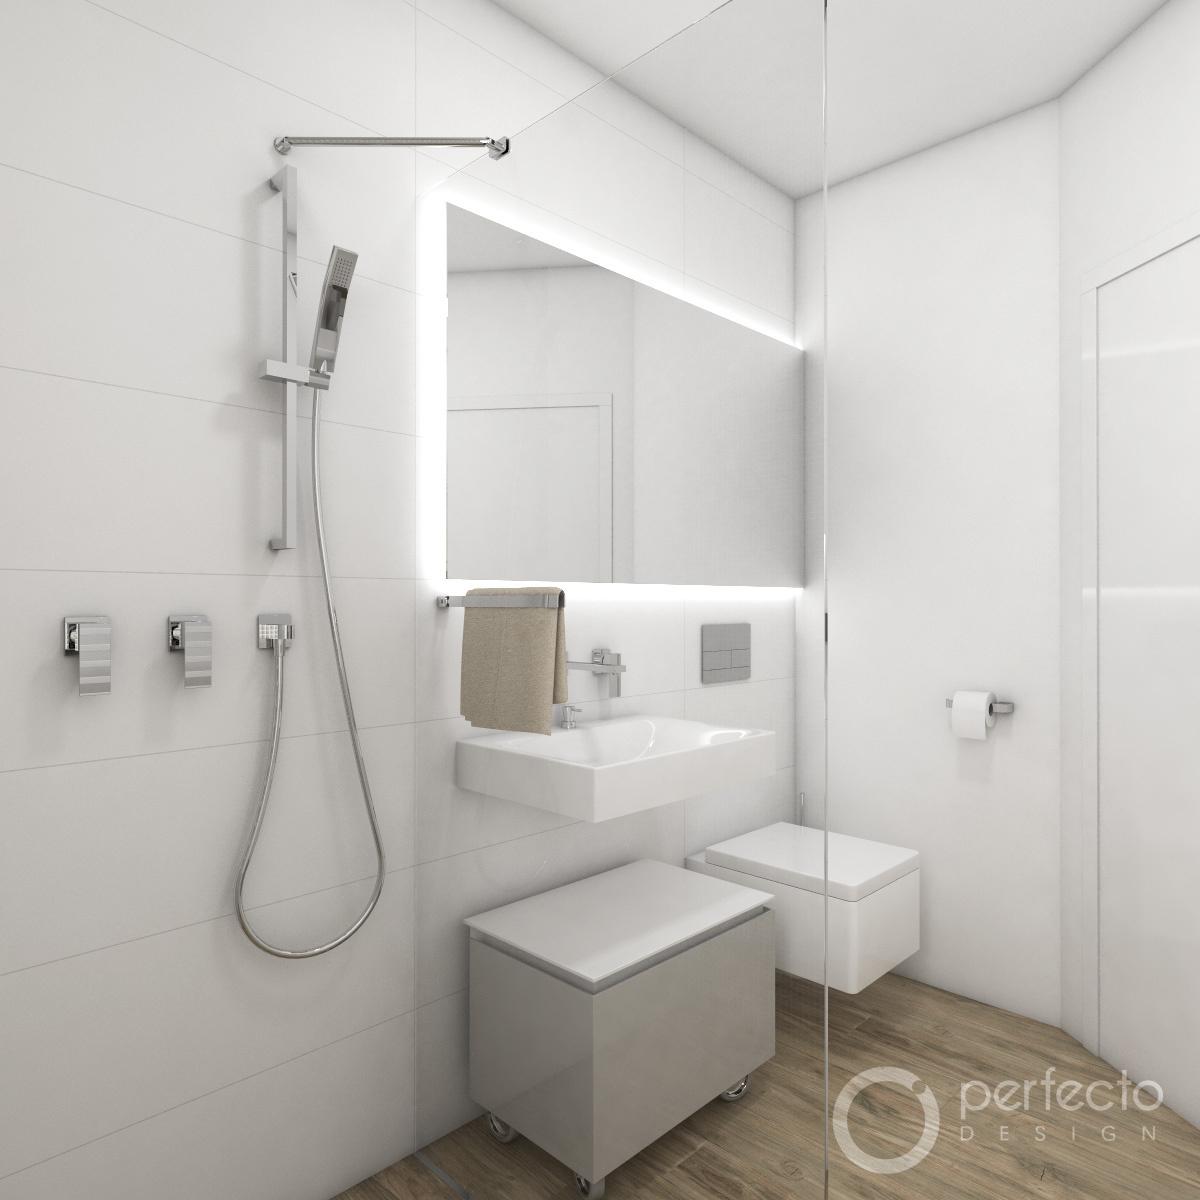 modernes badezimmer perla | perfecto design, Badezimmer ideen